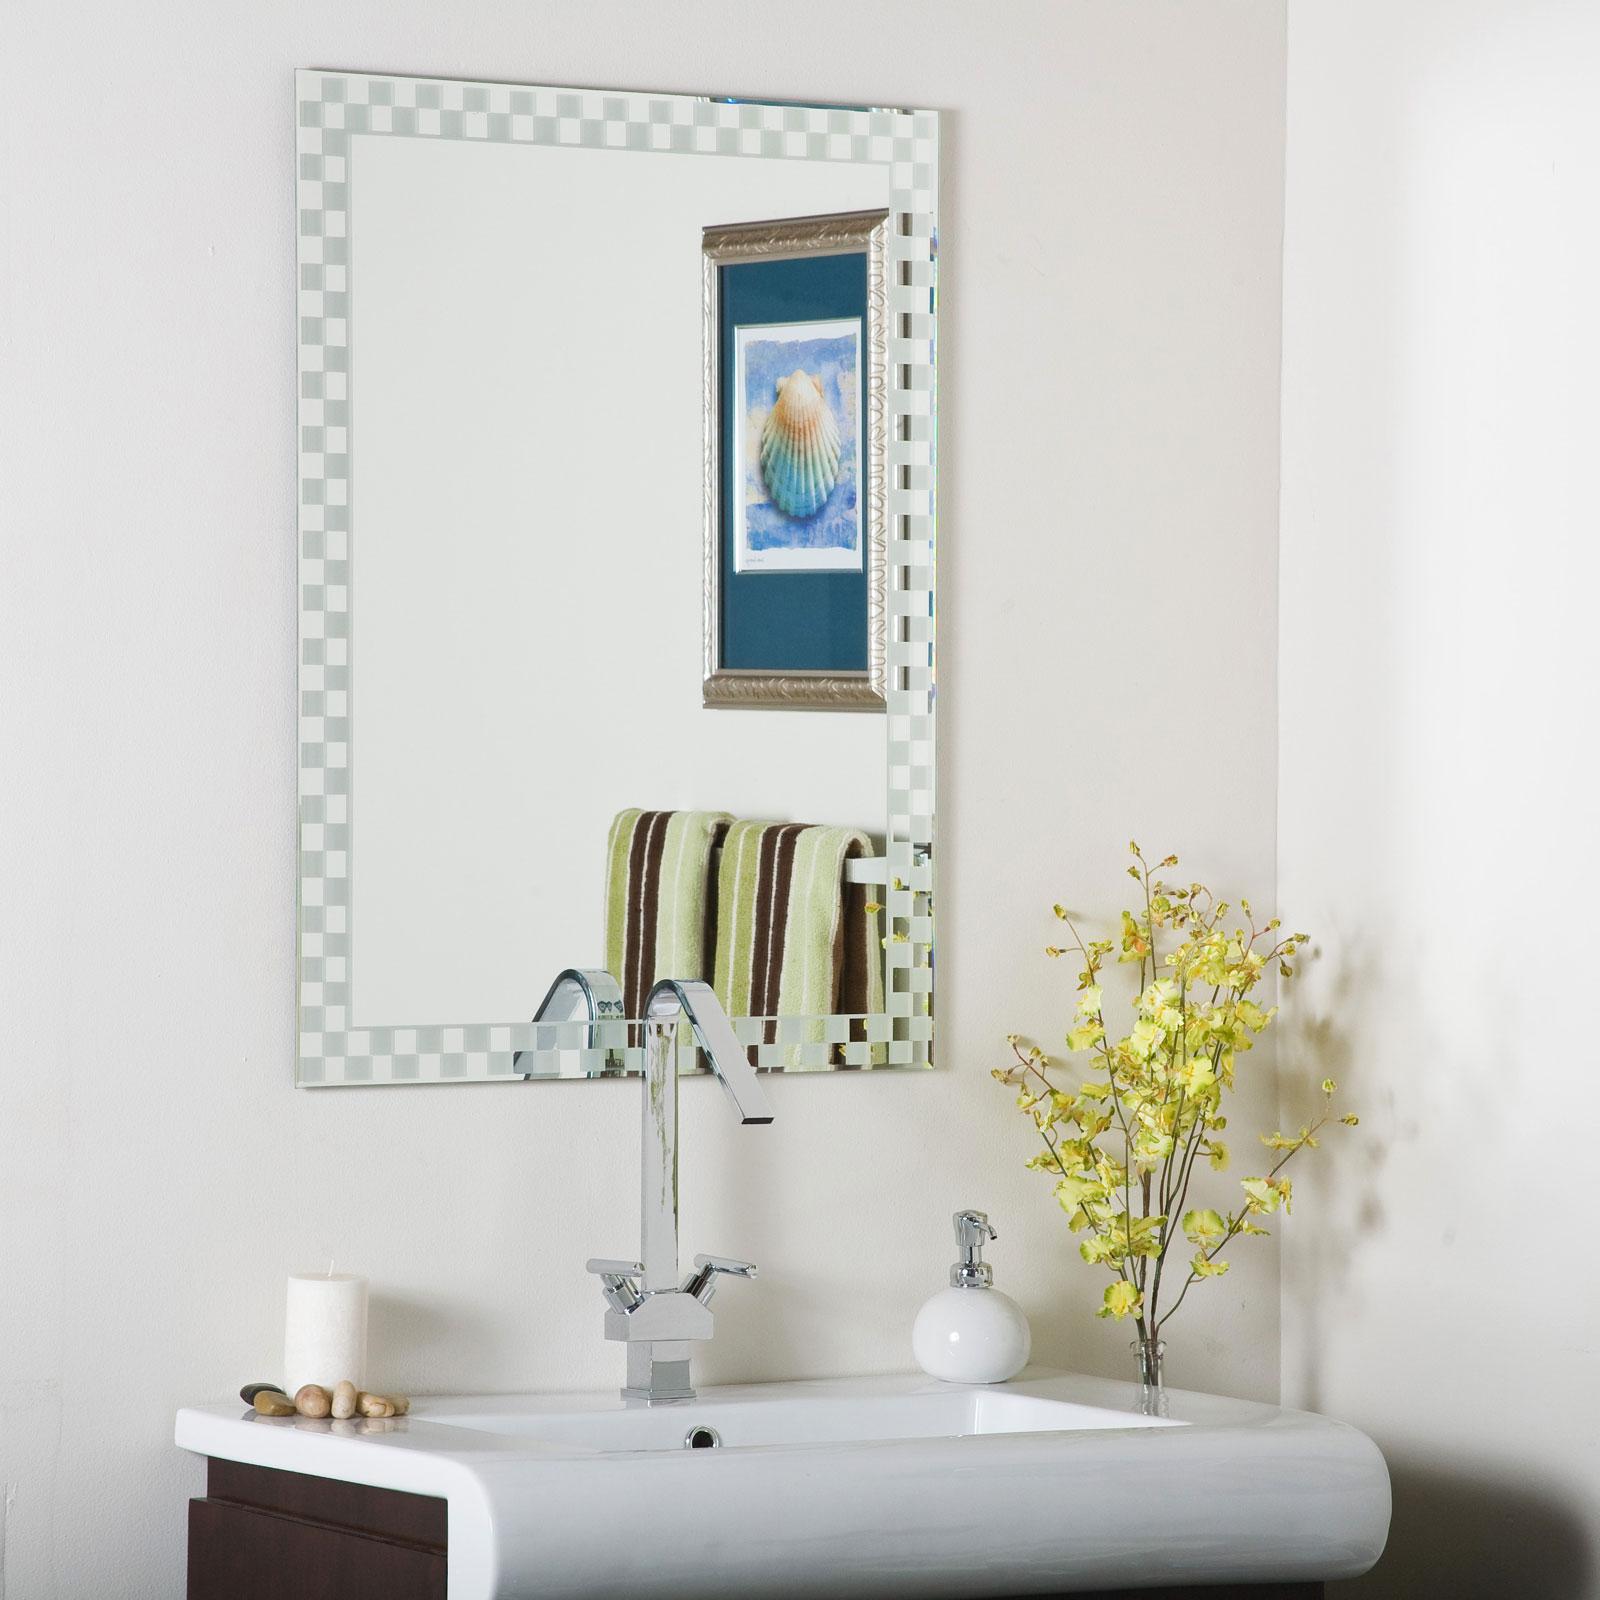 Checkers Frameless Wall Mirror By Decor Wonderland In Frameless Mirrors